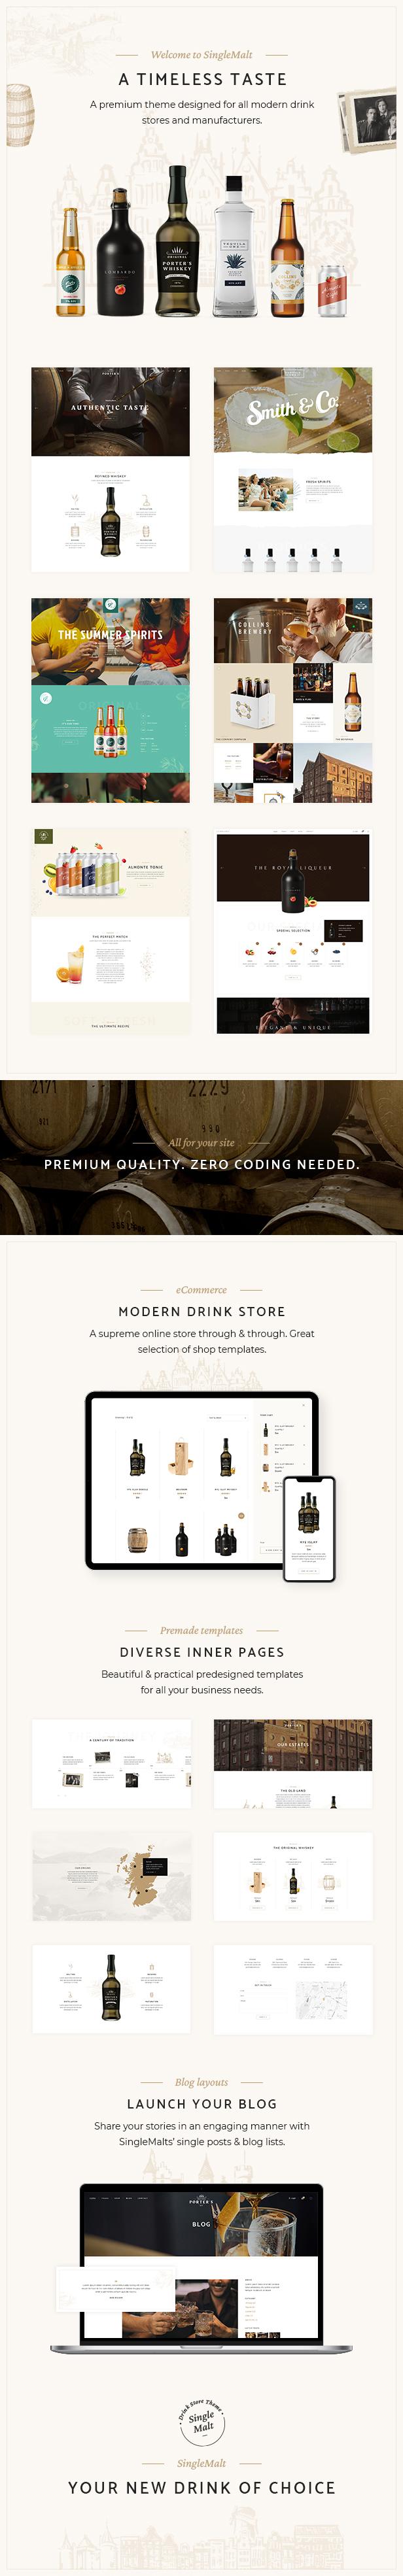 SingleMalt - Drink Store Theme - 2